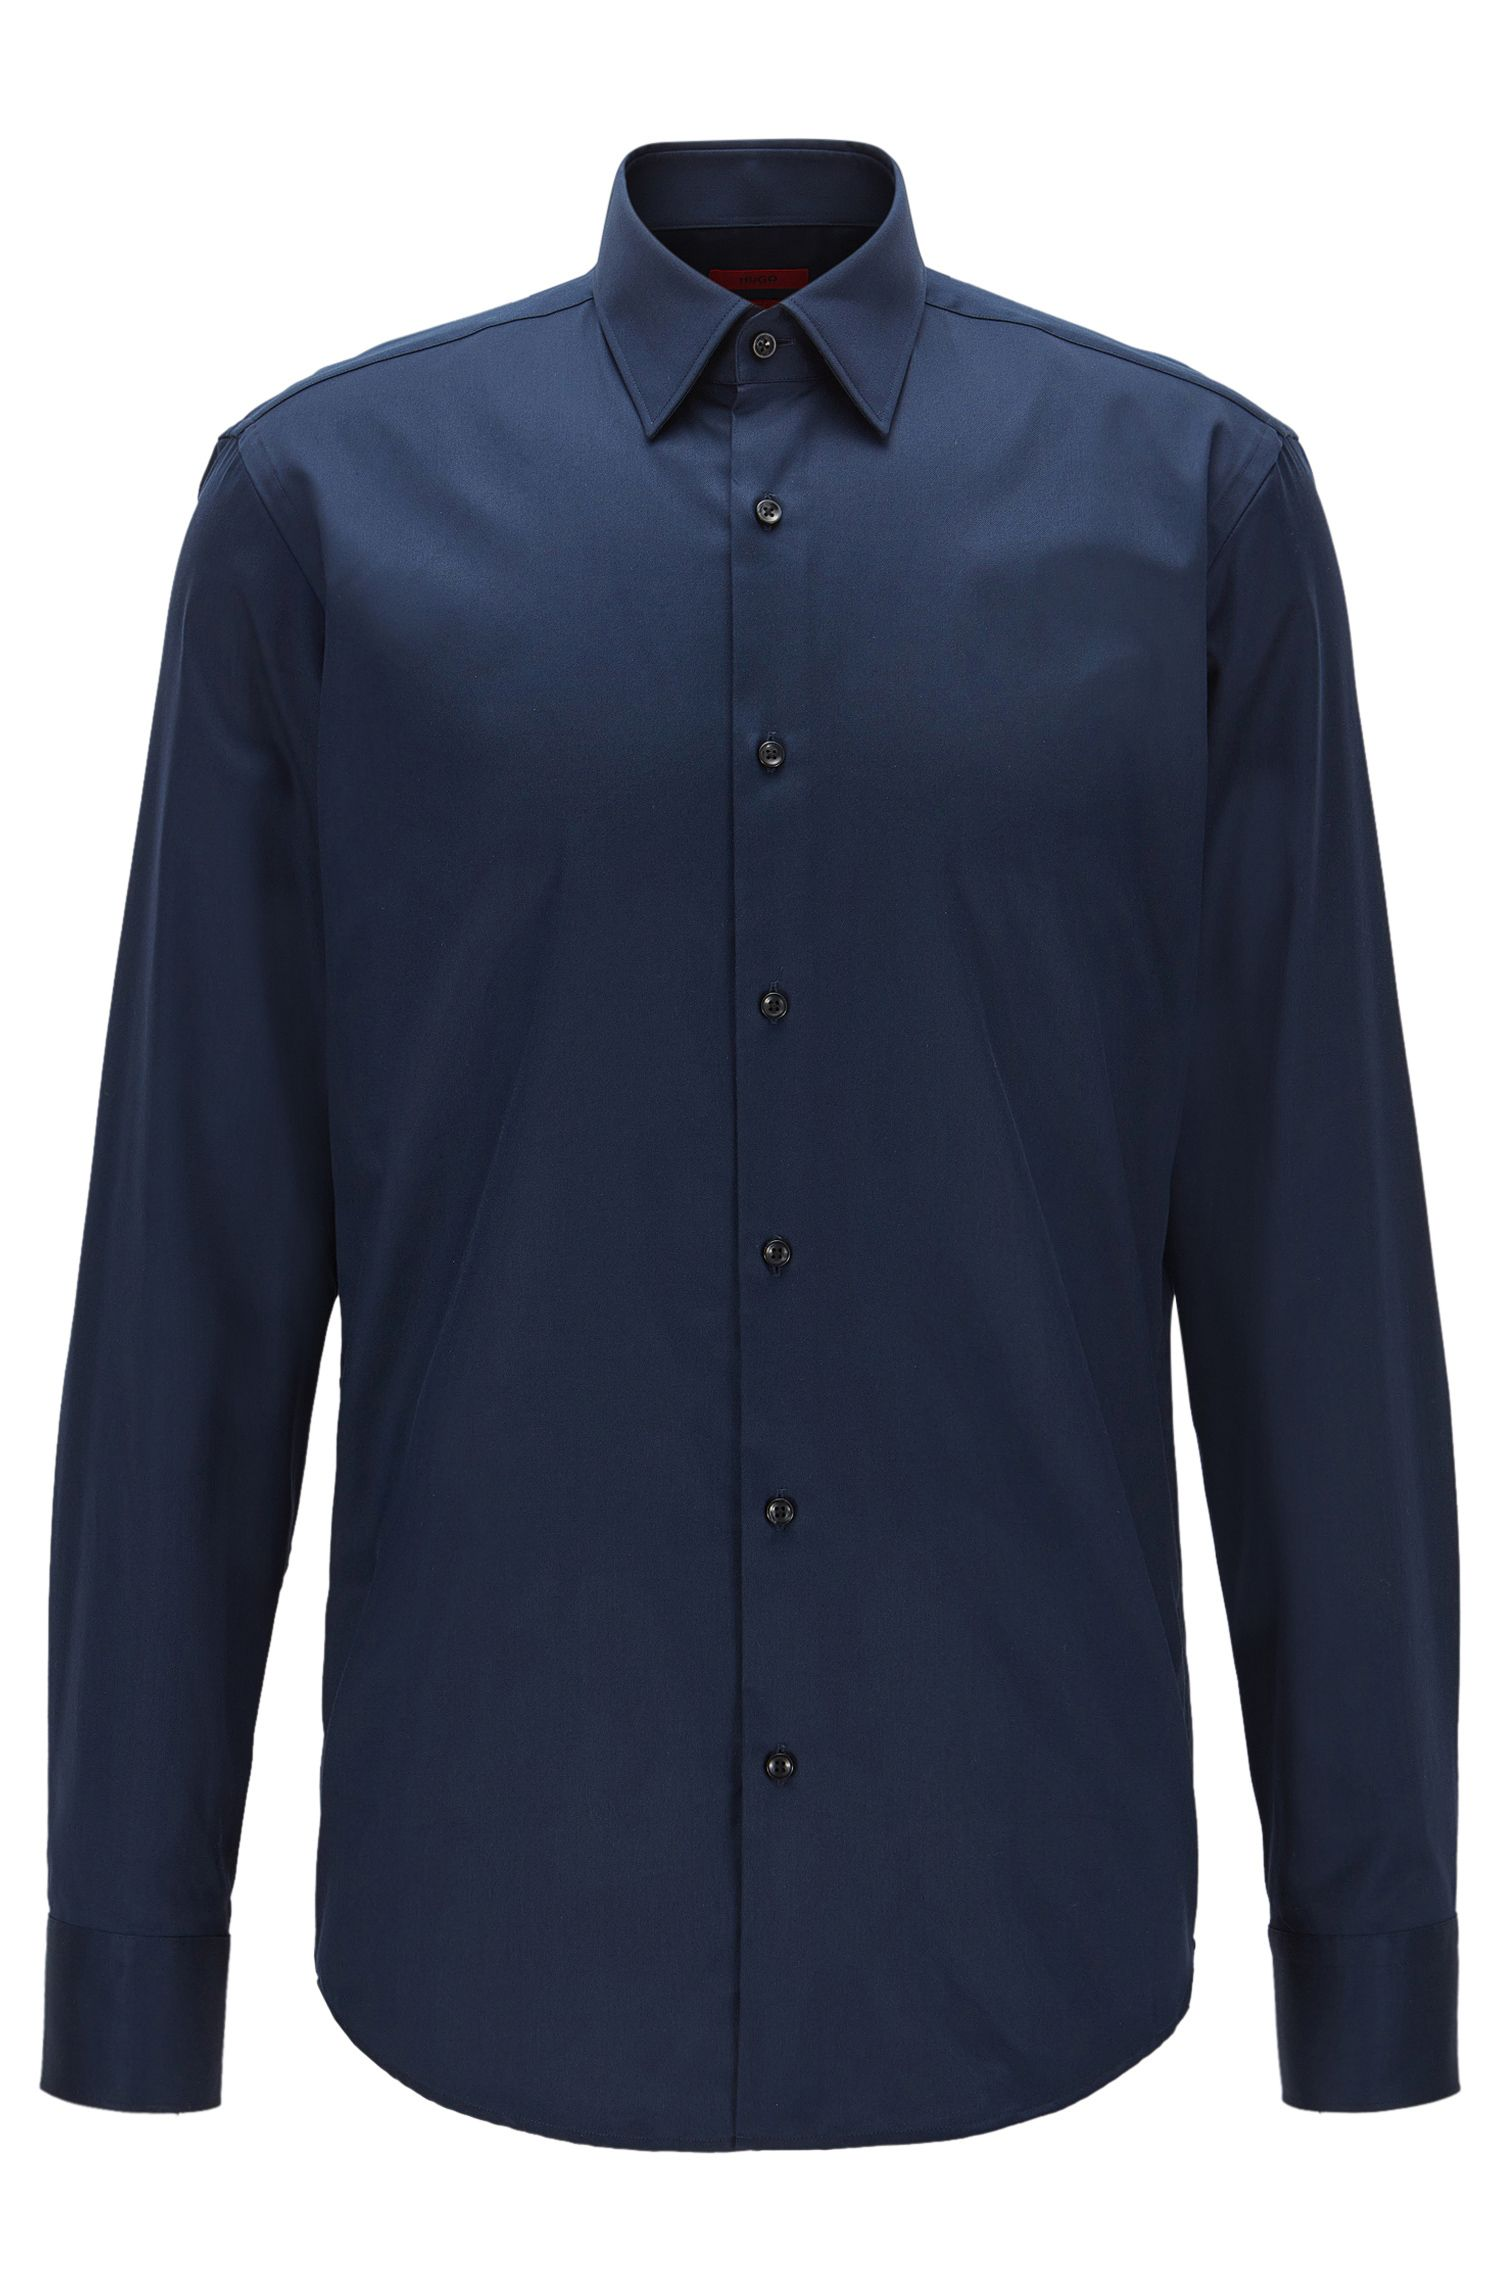 Regular-fit shirt in diagonal striped cotton